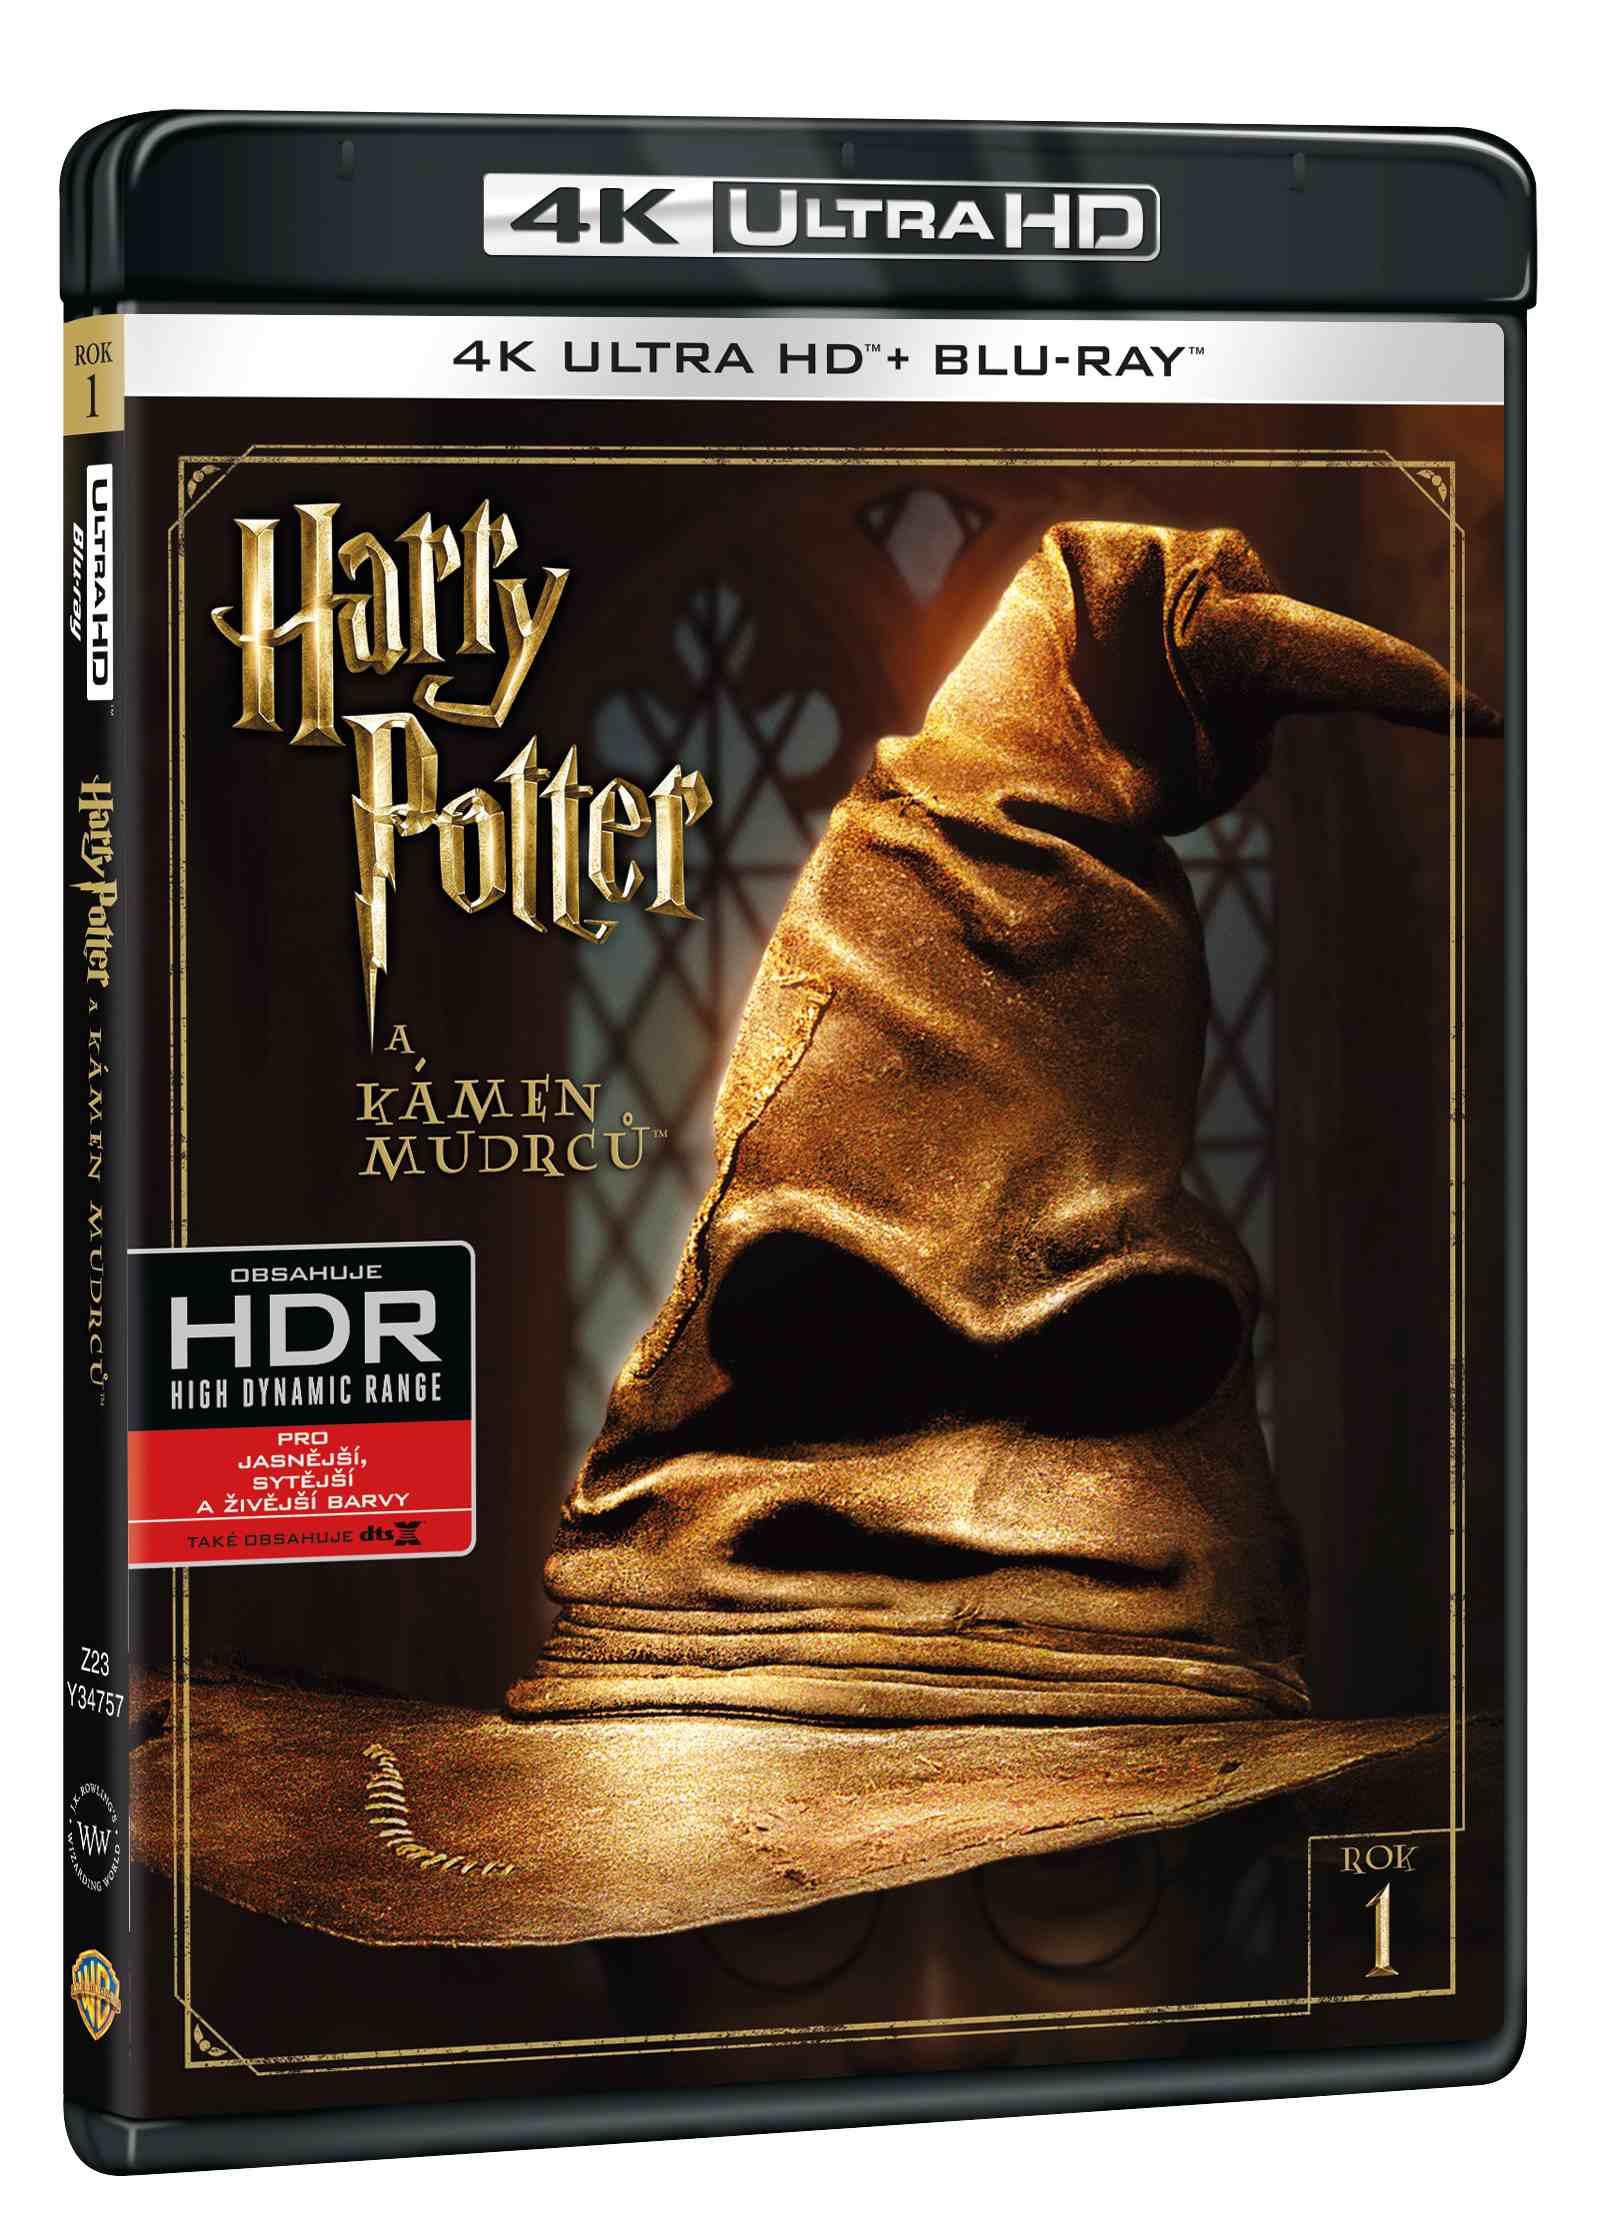 HARRY POTTER A KÁMEN MUDRCŮ (4K ULTRA HD) - UHD Blu-ray + Blu-ray (2 BD)